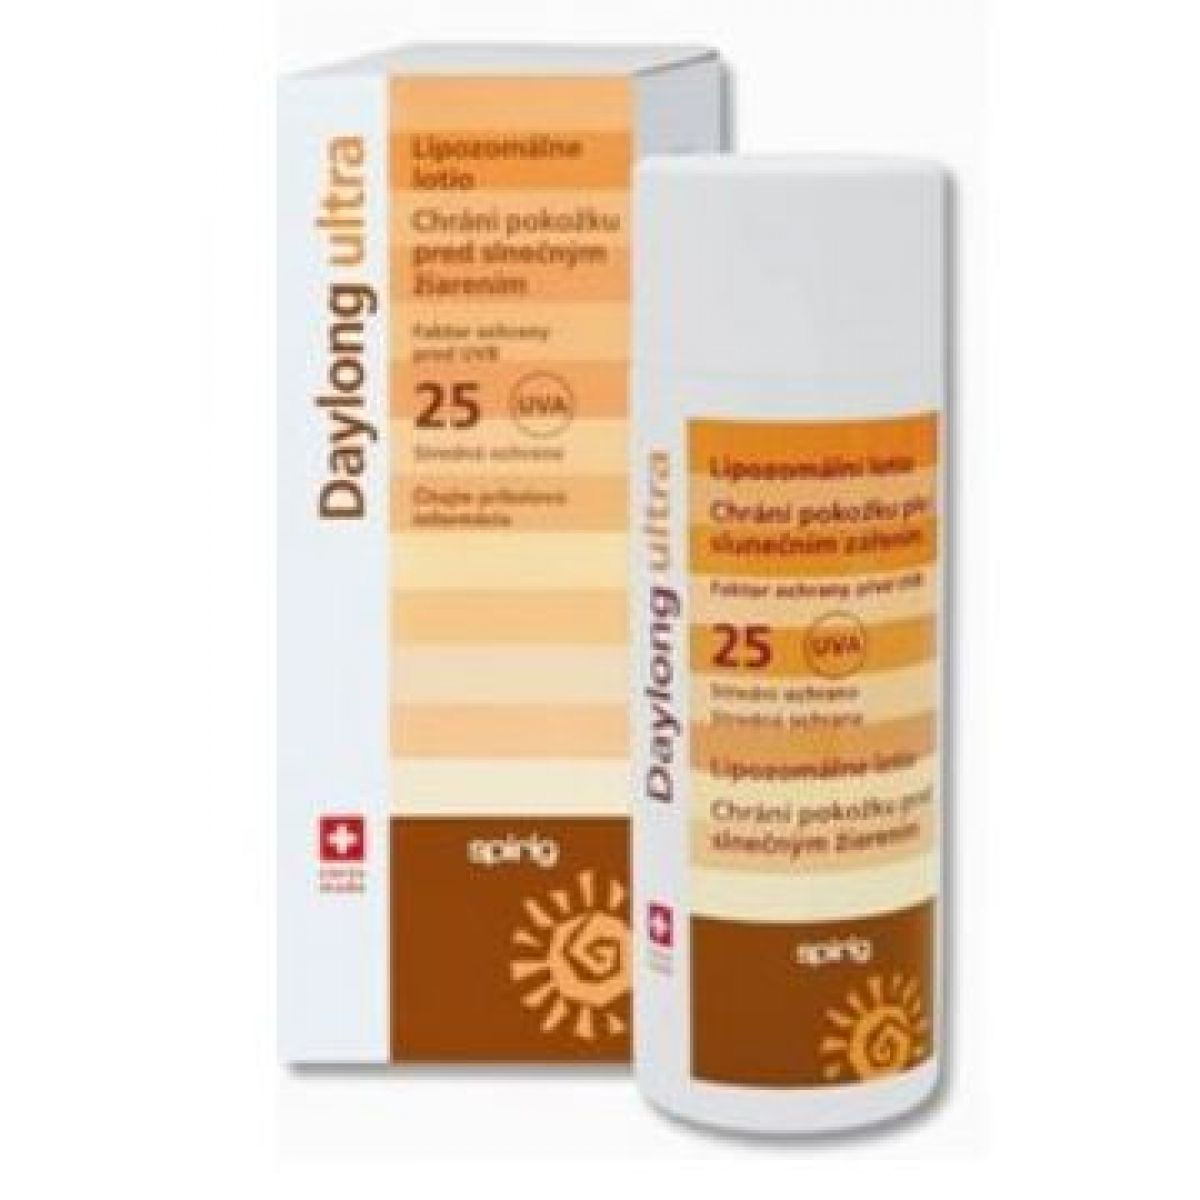 Daylong 25 Ultra Gelfluid 50ml